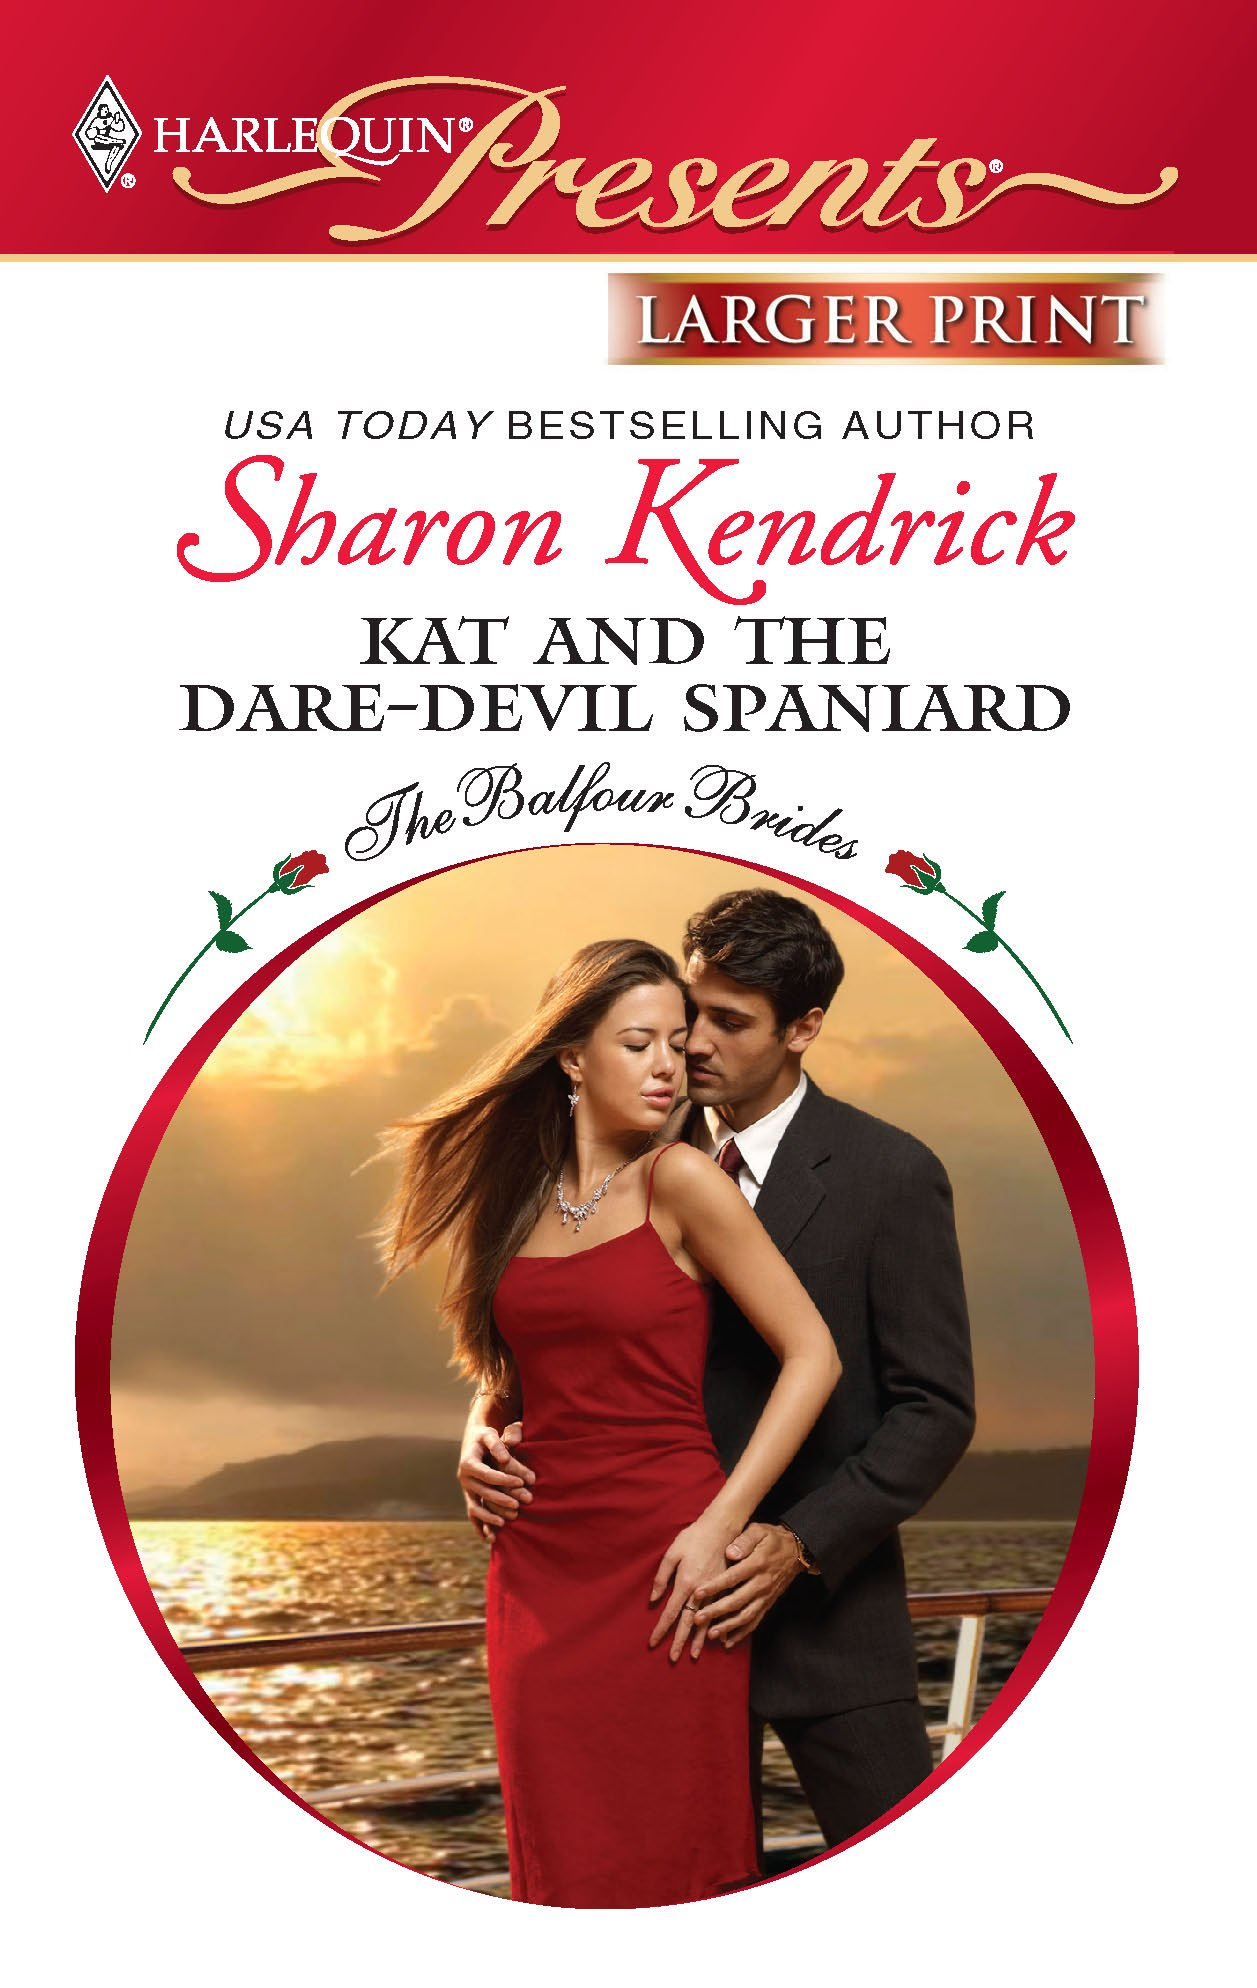 Kat and the dare-devil spaniard: sharon kendrick: 9780373129409.